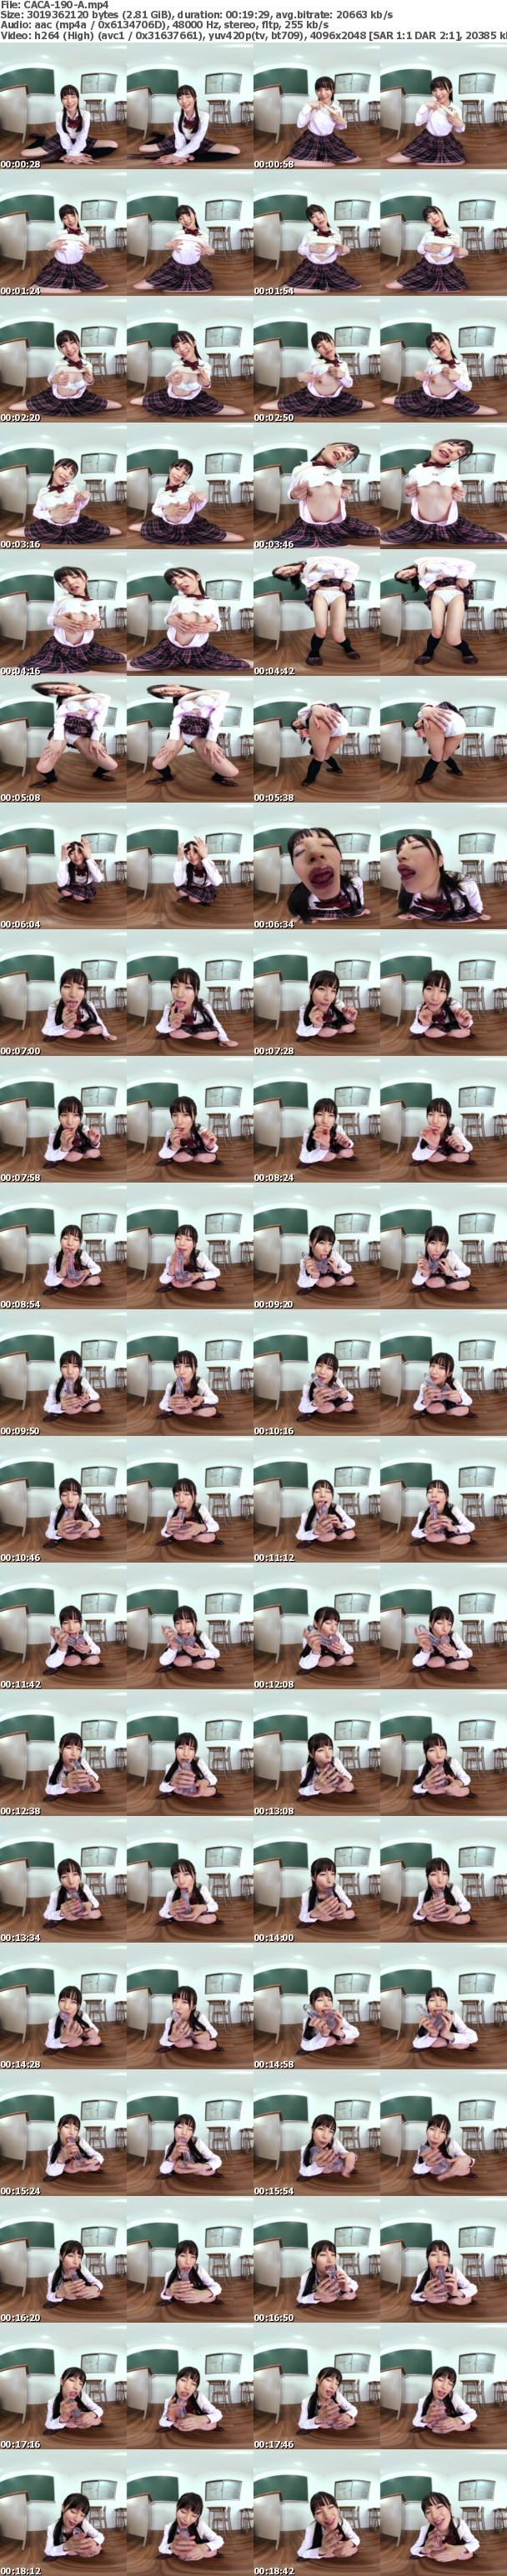 (VR) CACA-190 超精細カメラ撮影 射精コントロール!オナ指示痴女~美少女J●と放課後の教室で2人っきりのオナニー見せ合いっこ編~八尋麻衣